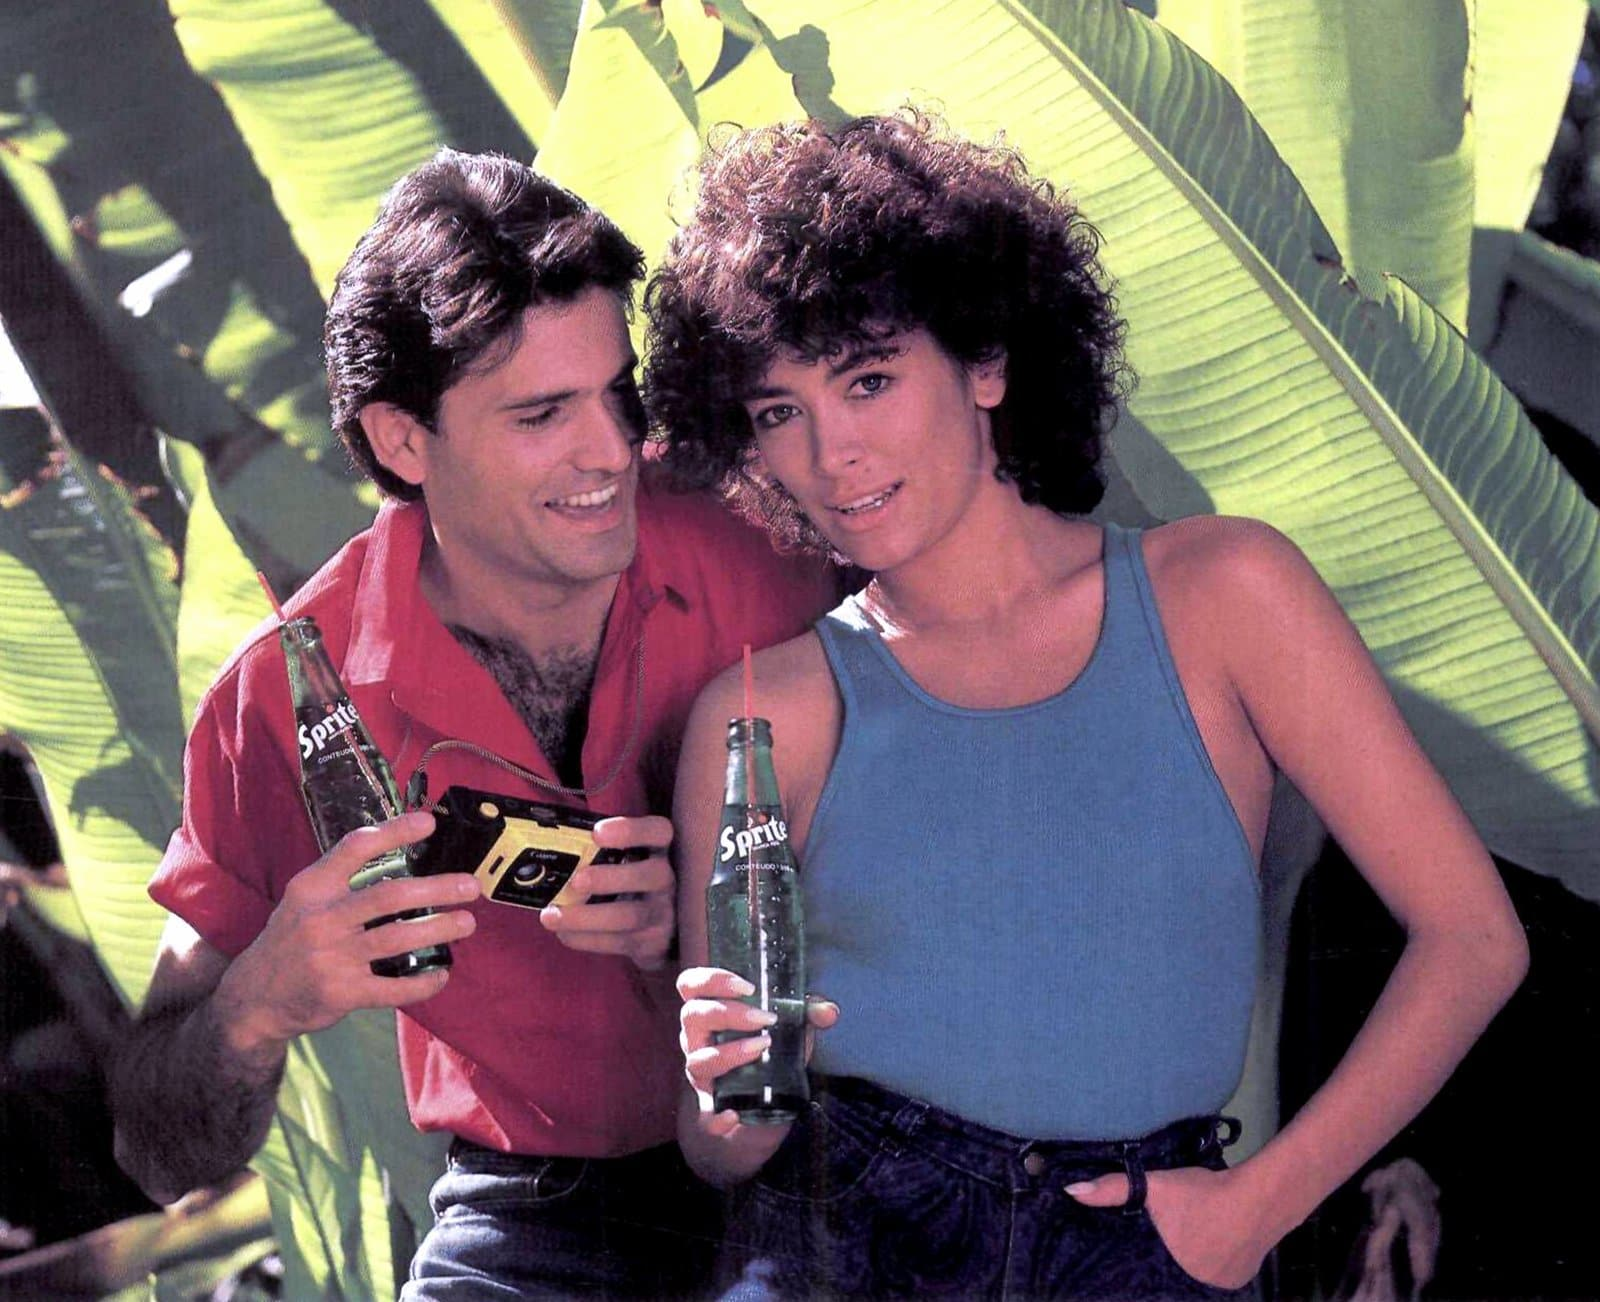 Hip exercising people drinking Sprite soda (1985)